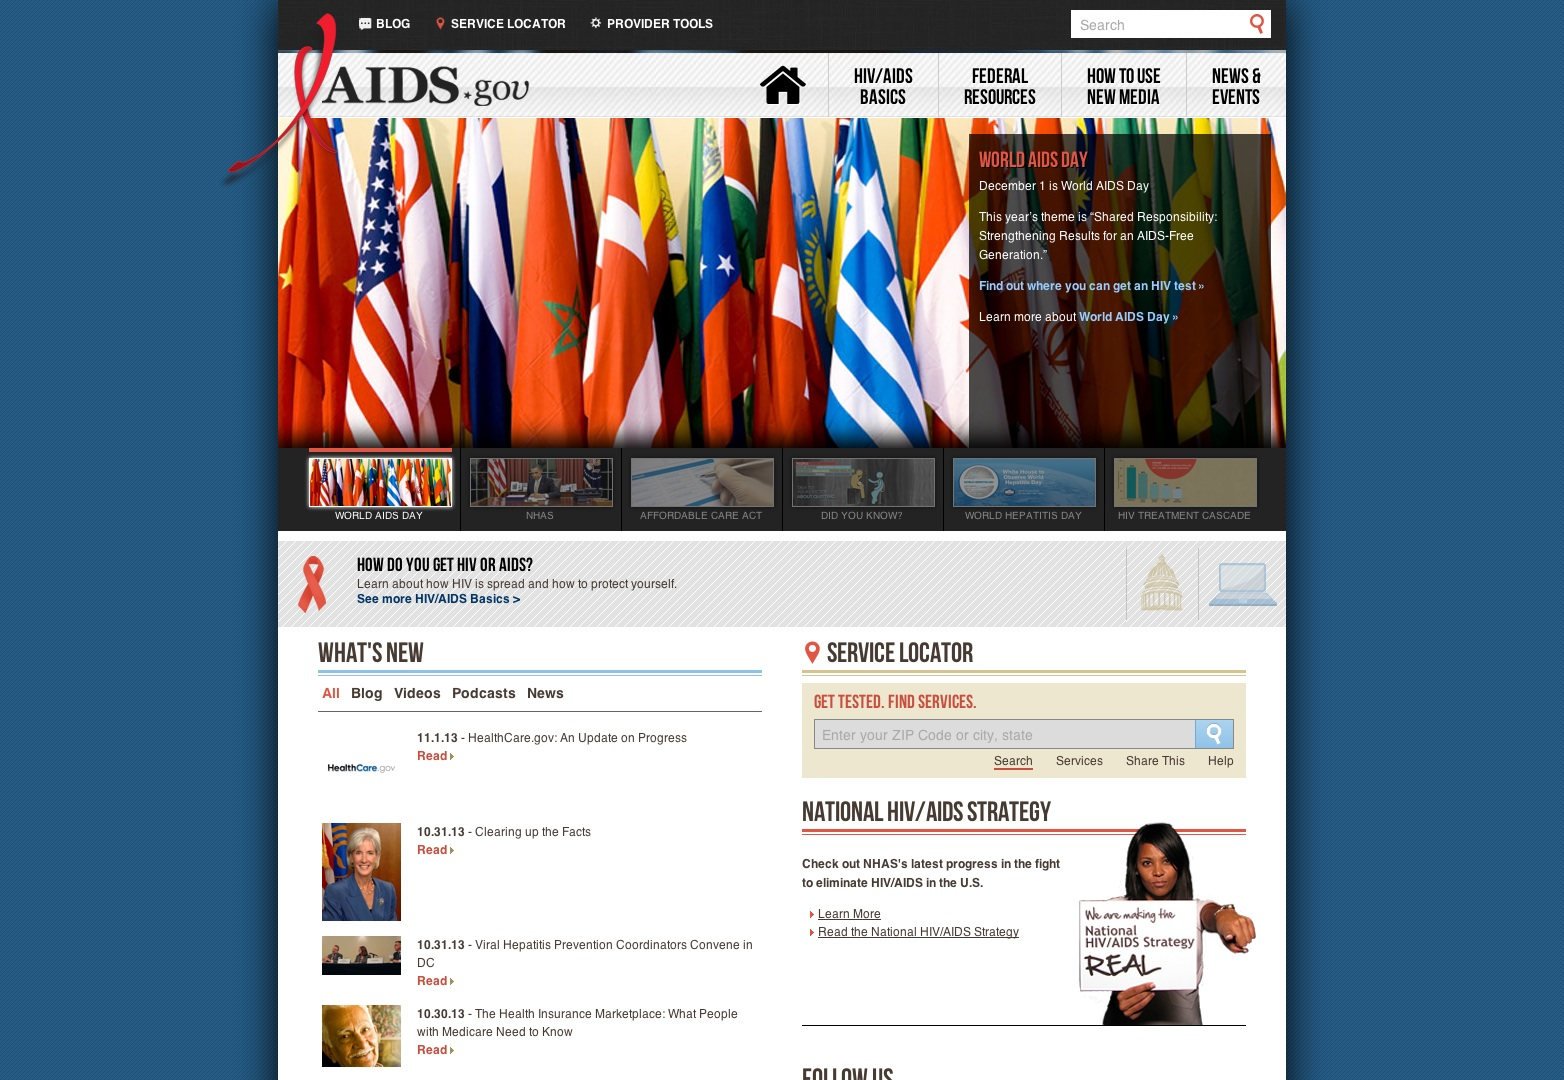 Tervetuloa AIDS.gov